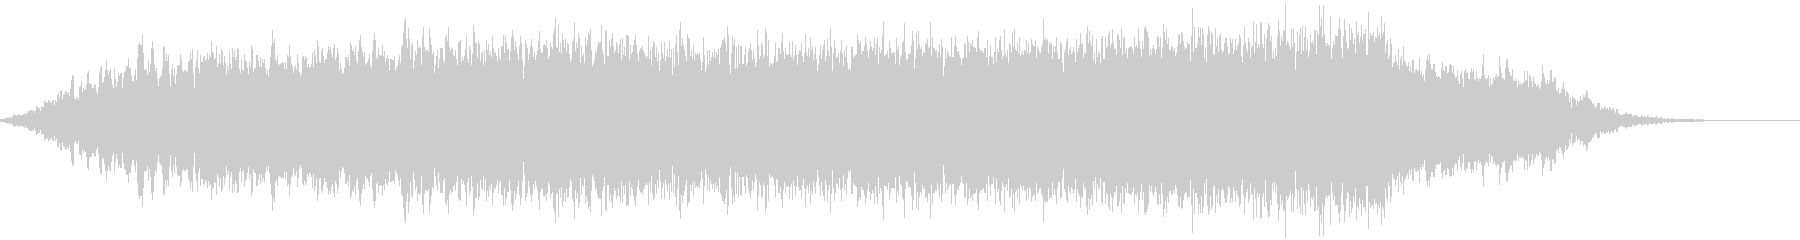 CINEMATIC RISER_39の未再生の波形